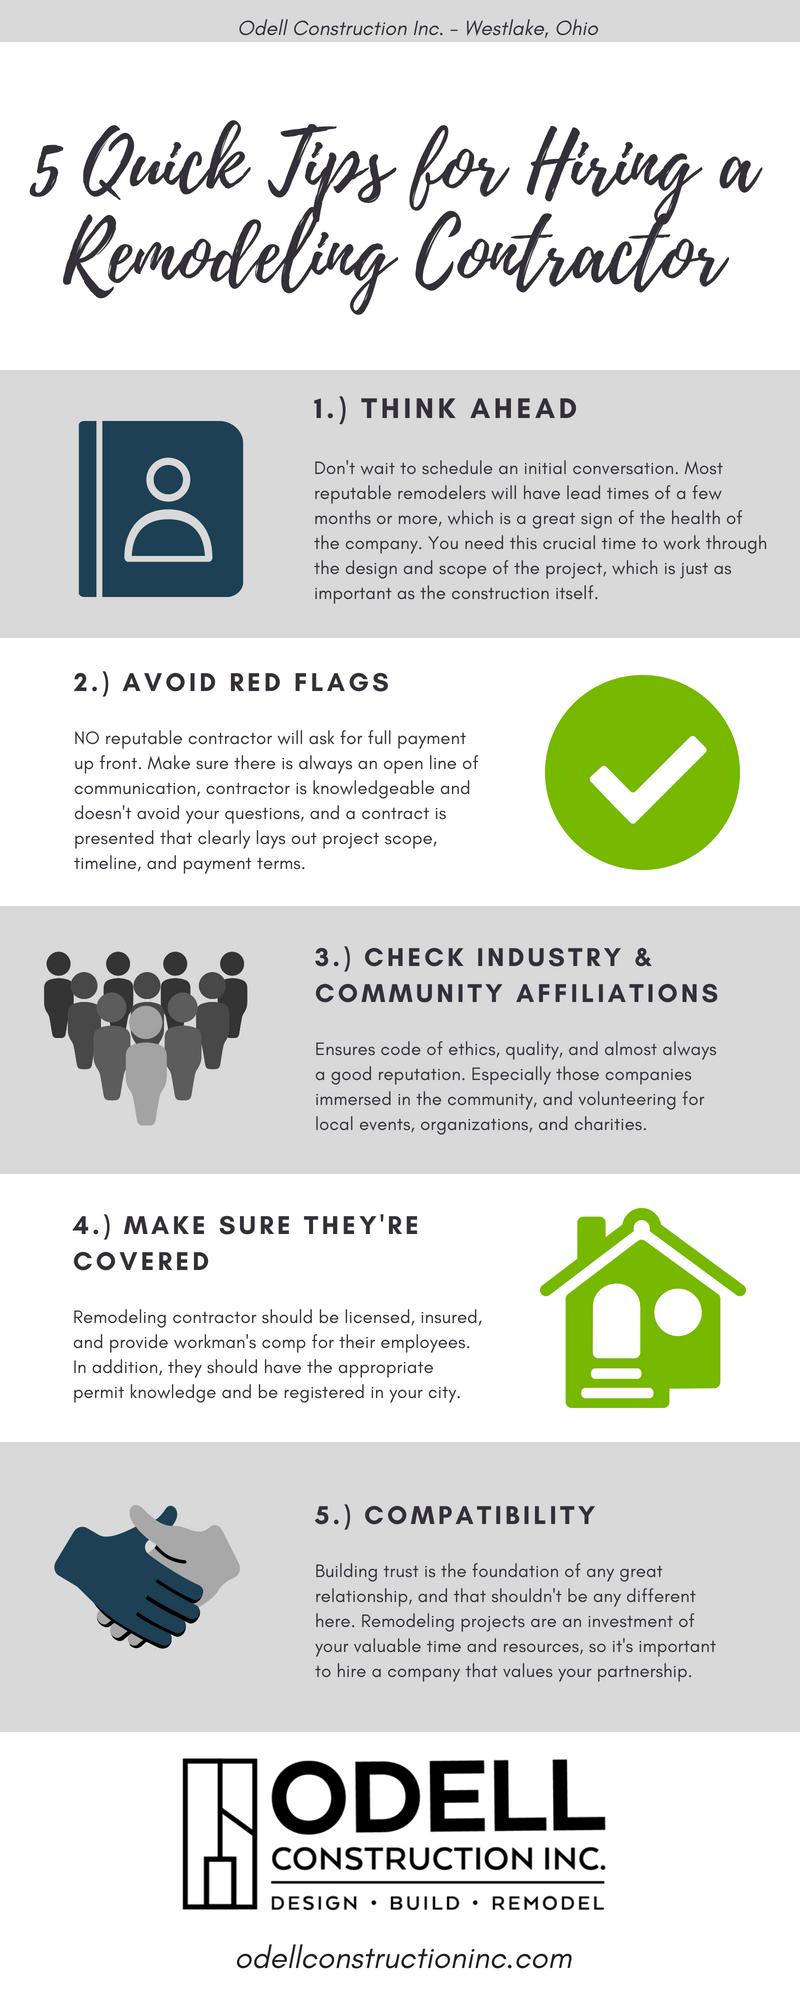 5 Quick Tips for Hiring a Remodeler.jpg